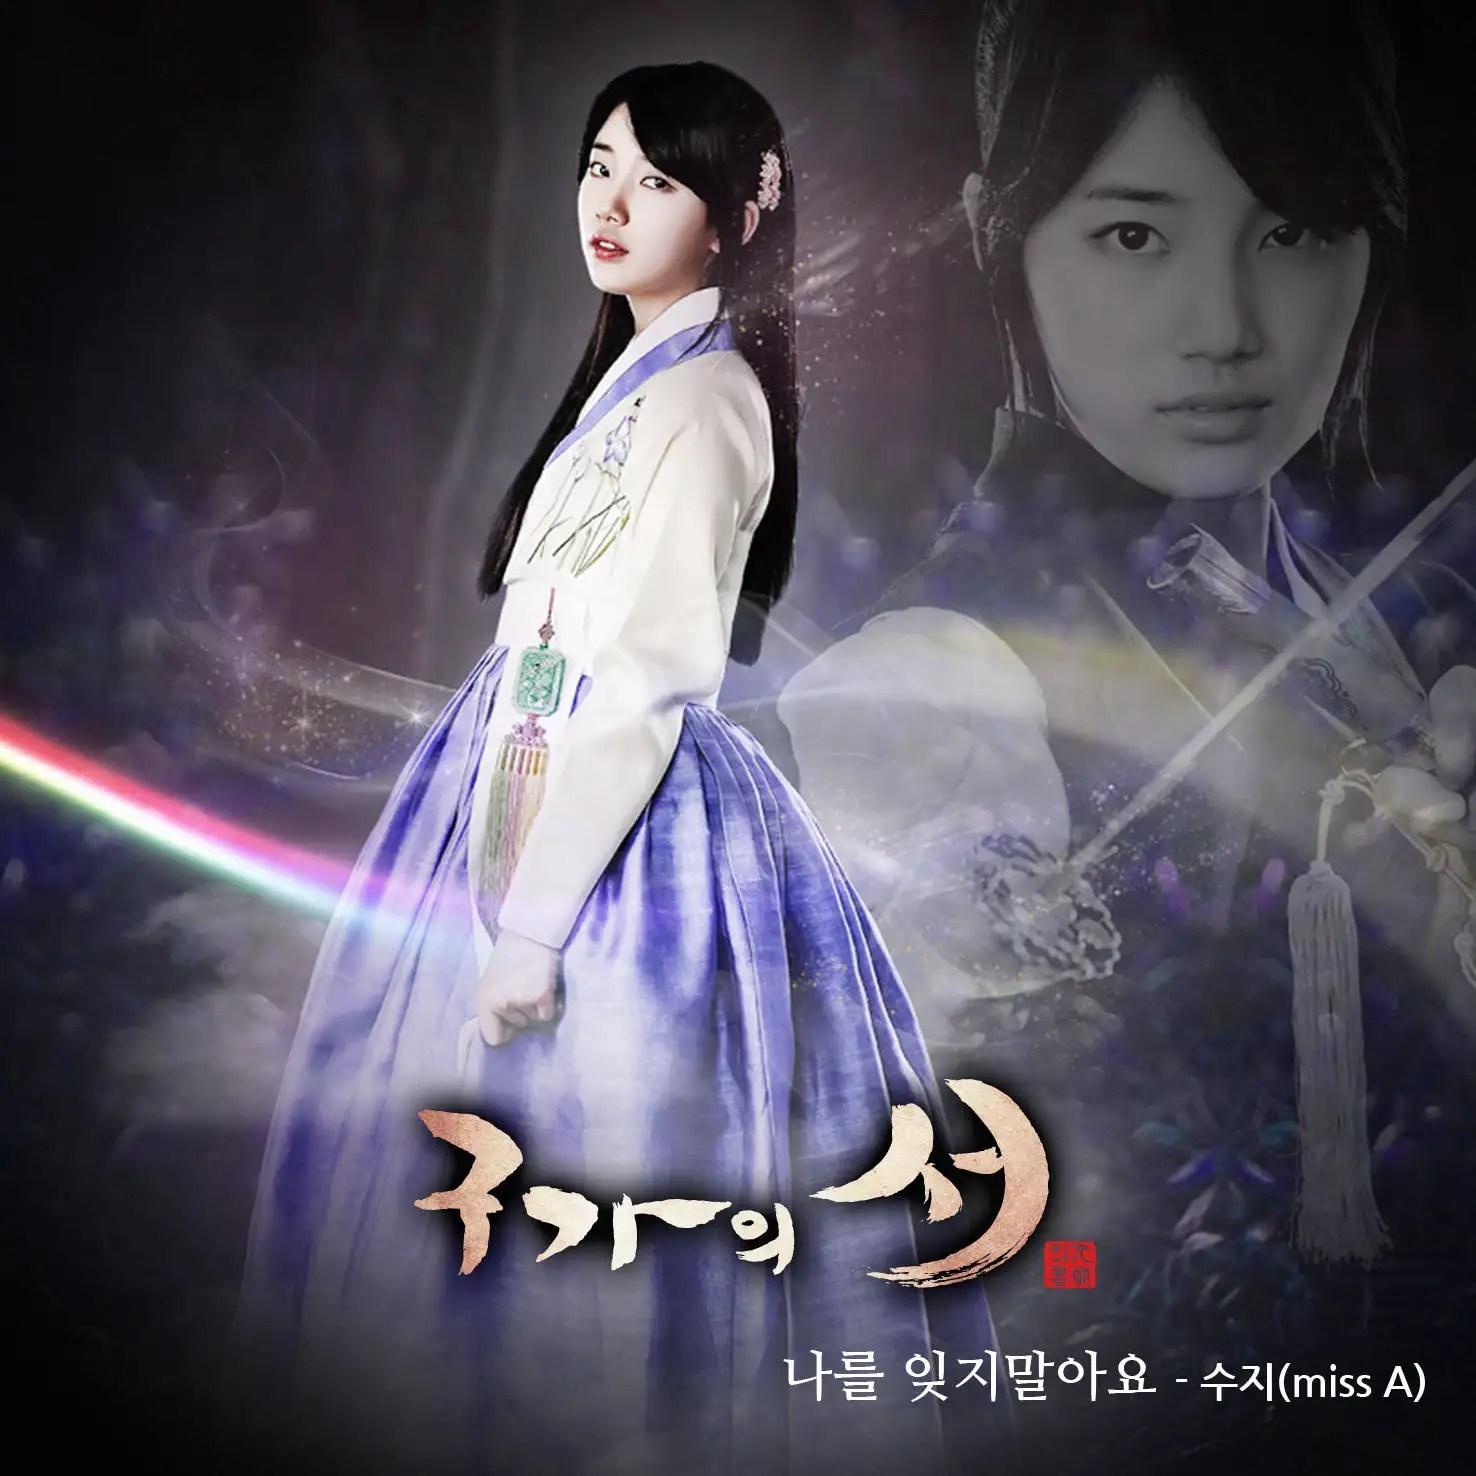 [Single] Suzy (Miss A) - Gu Family Book OST Part. 4